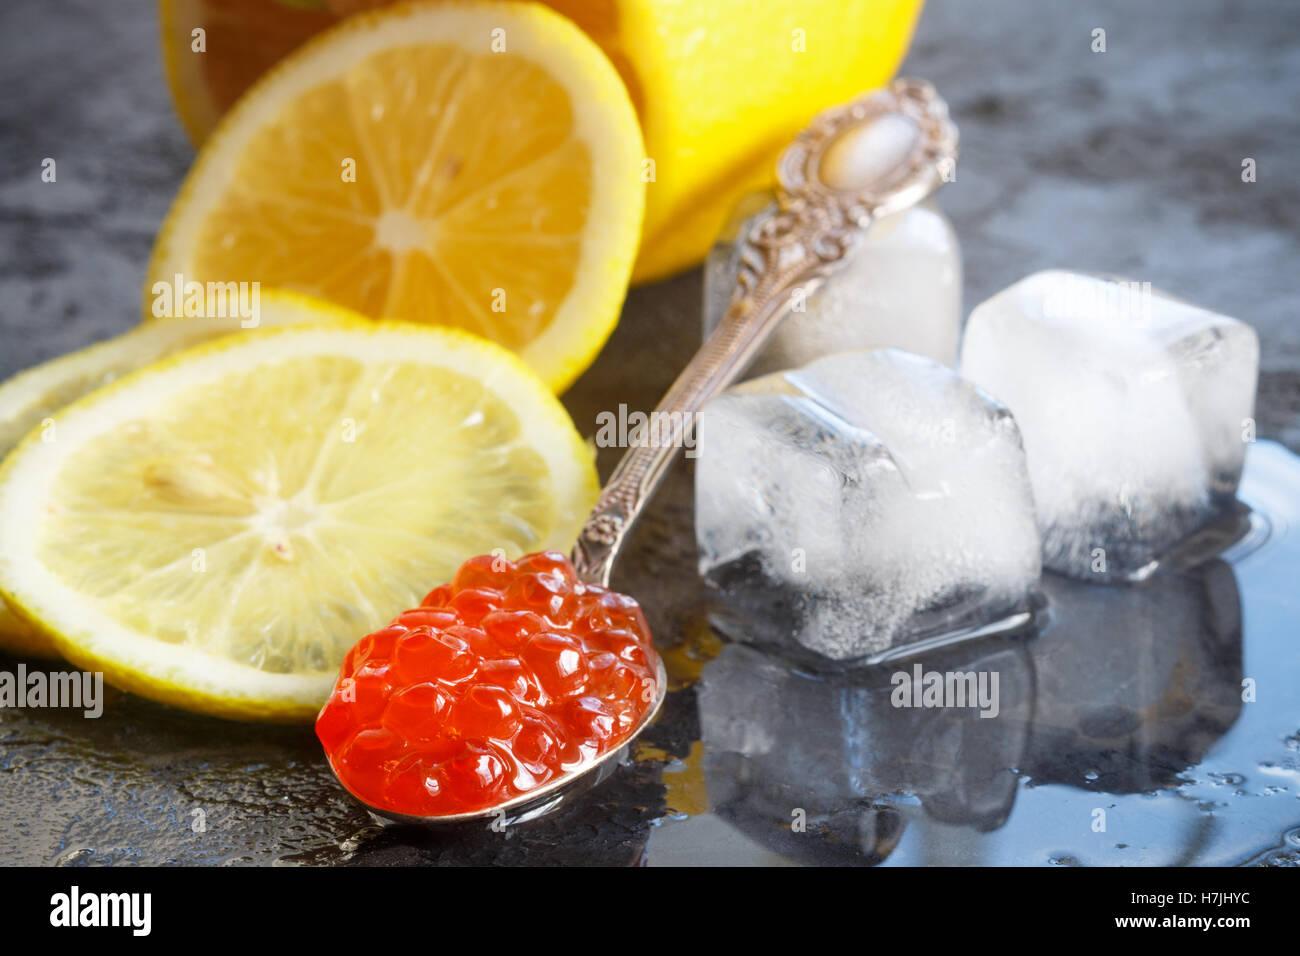 Rojo Salmón caviar y limón. Enfoque selectivo Imagen De Stock